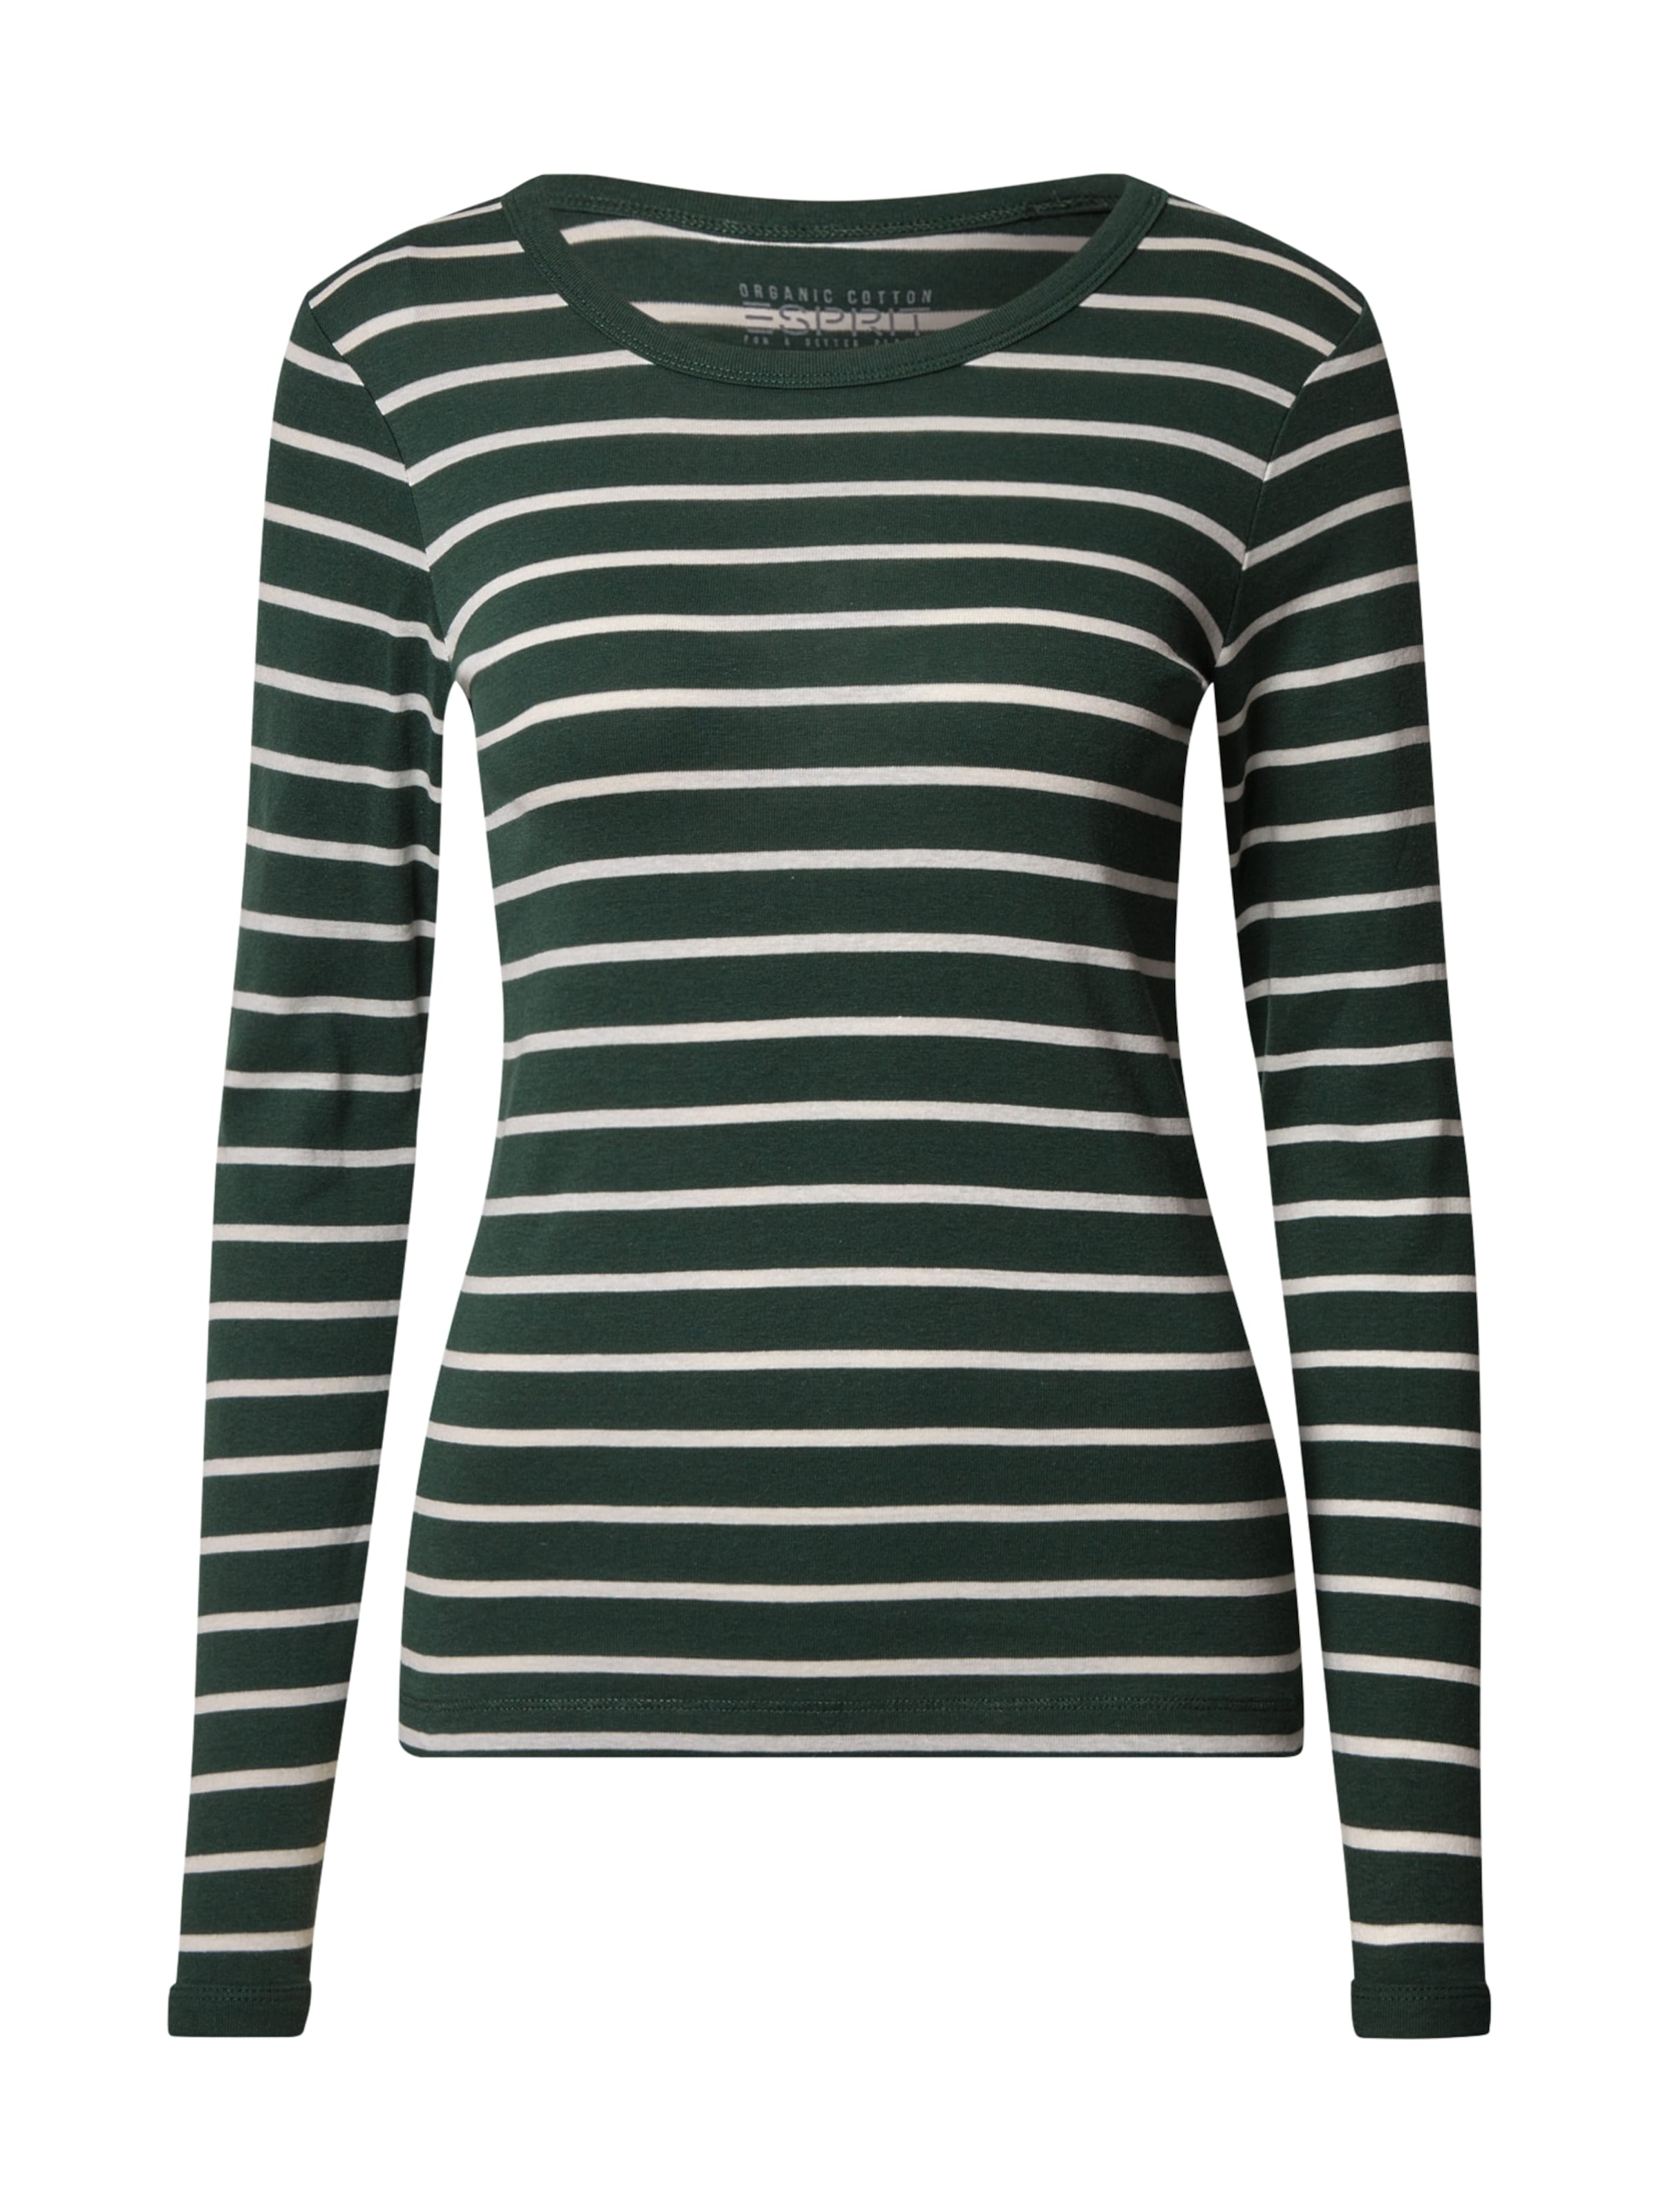 ESPRIT Shirt in dunkelgrün / weiß